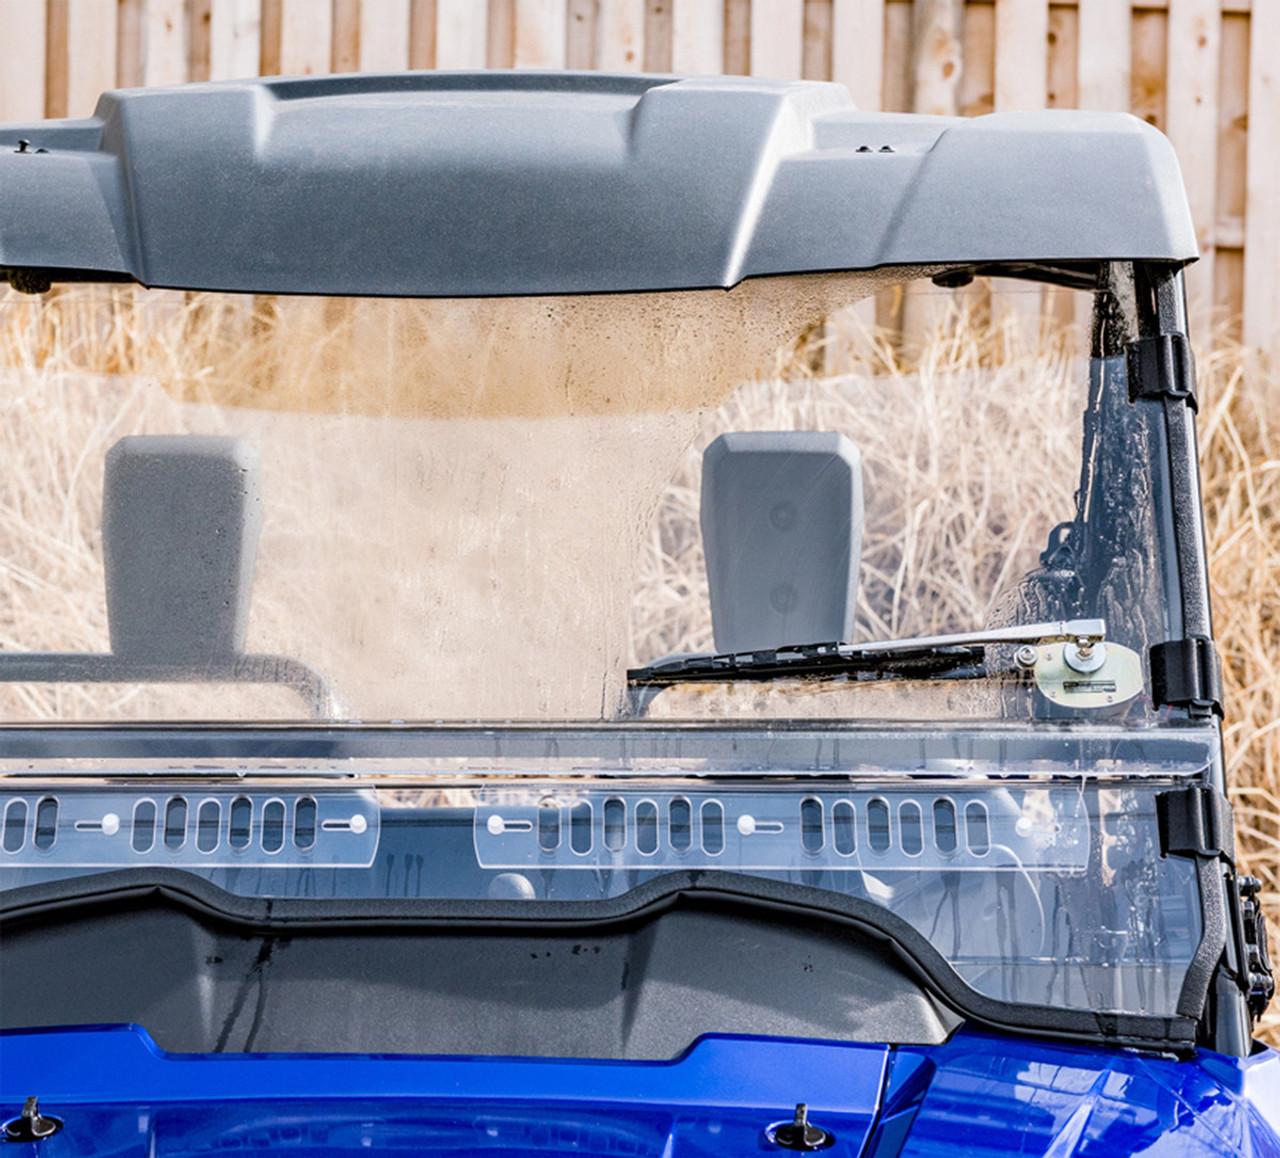 Polaris Ranger 570 Midsize 2015-2016 Bad Dawg Rear Window Windshield Cab Back